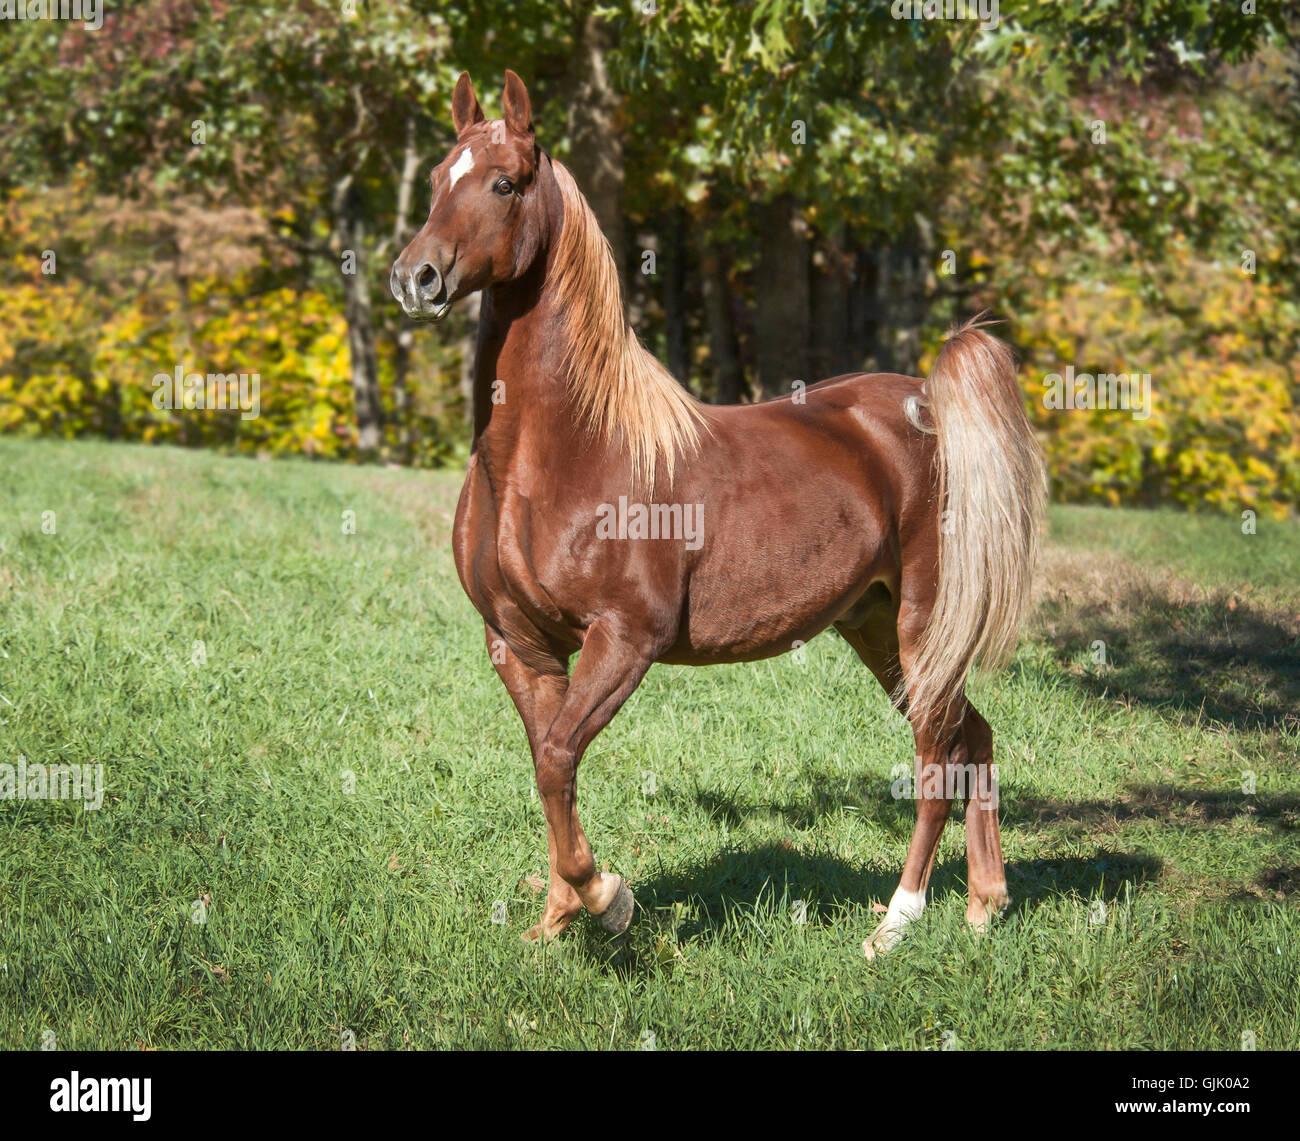 Saddlebred Horse gelding in green grass pasture. - Stock Image